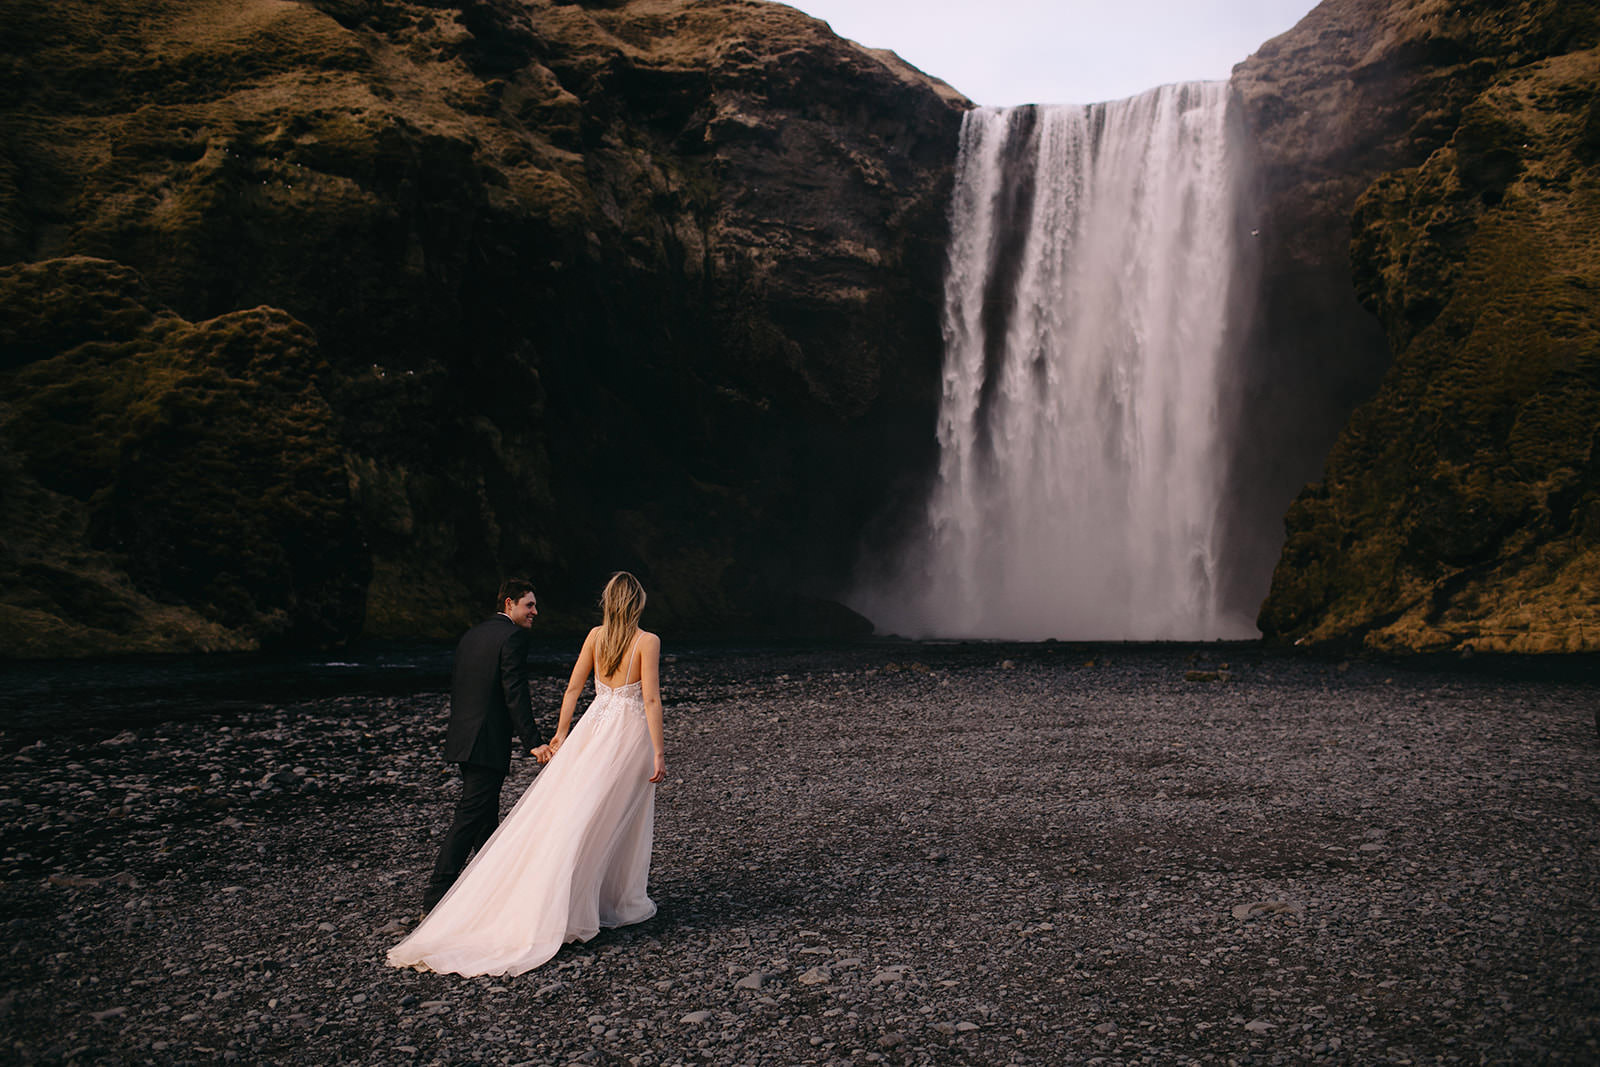 Icelandic Iceland Elopement Wedding Elope Photographer Eloping Reykjavík Vik Black Sand Beach Jökulsárlón Skogafoss Waterfall Vestrahorn Mountain Liz Osban Photography Destination 95.jpg